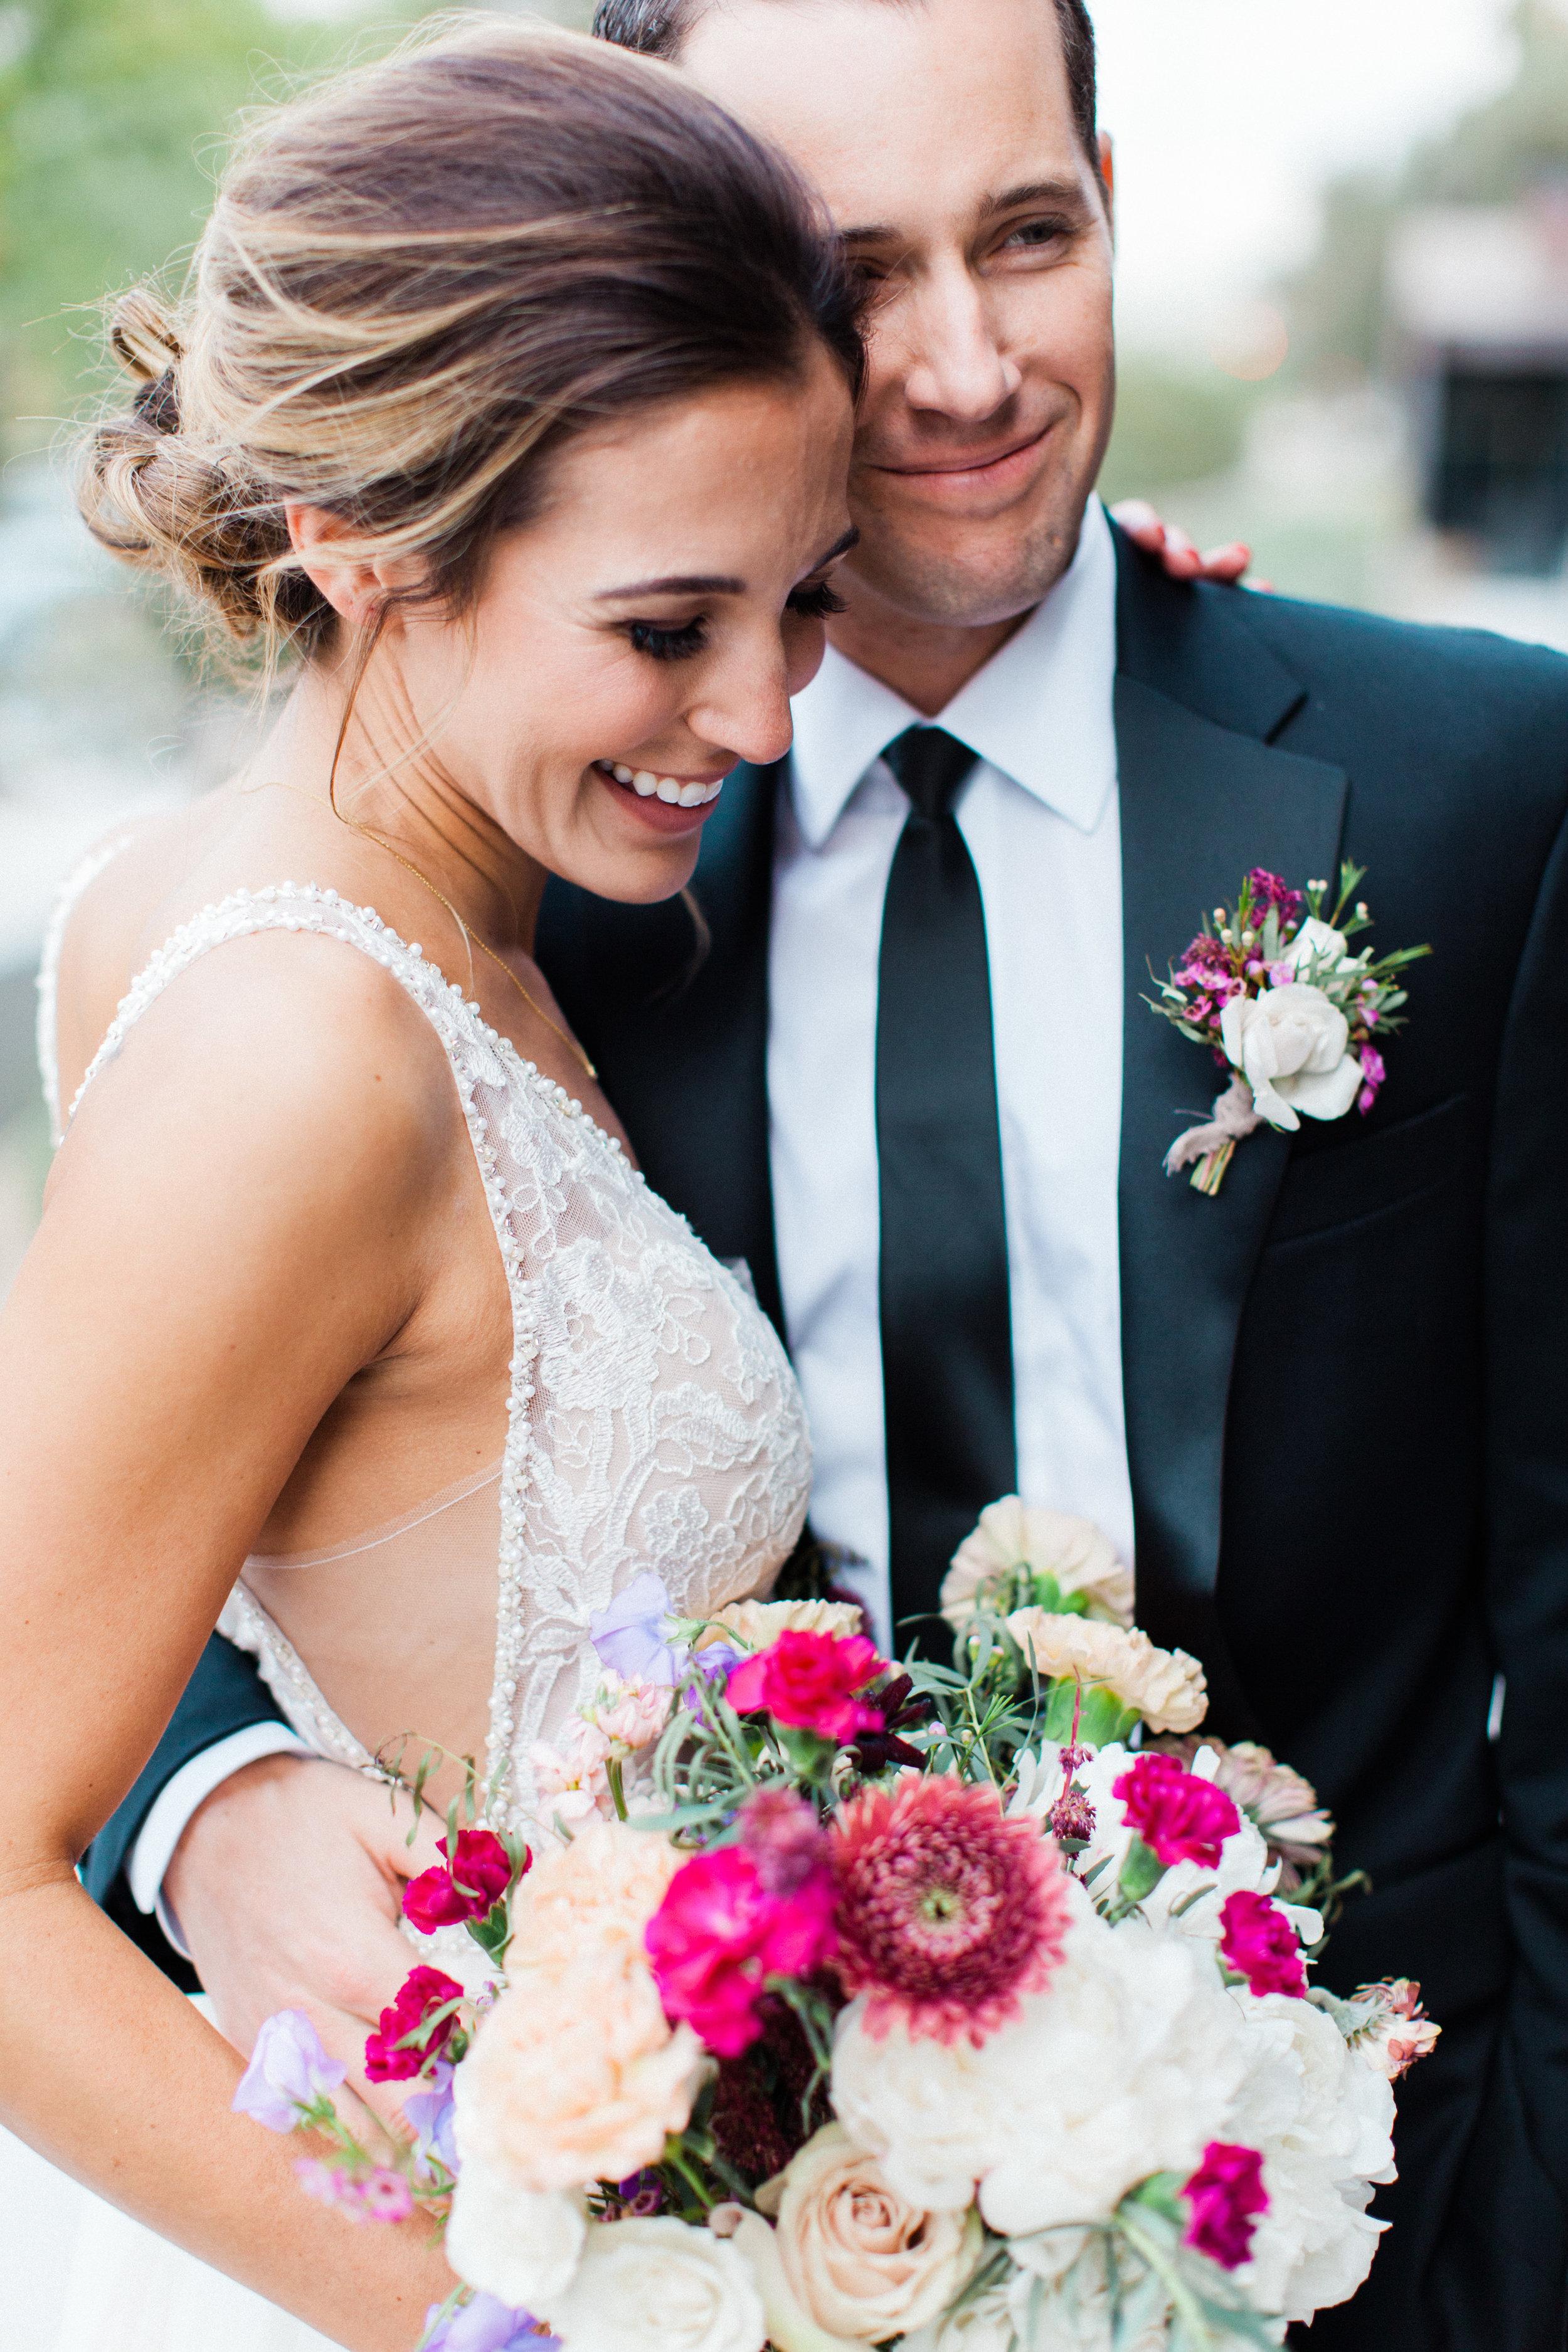 Mauve and Lavender Modern Wedding Inspiration - Bride and Groom